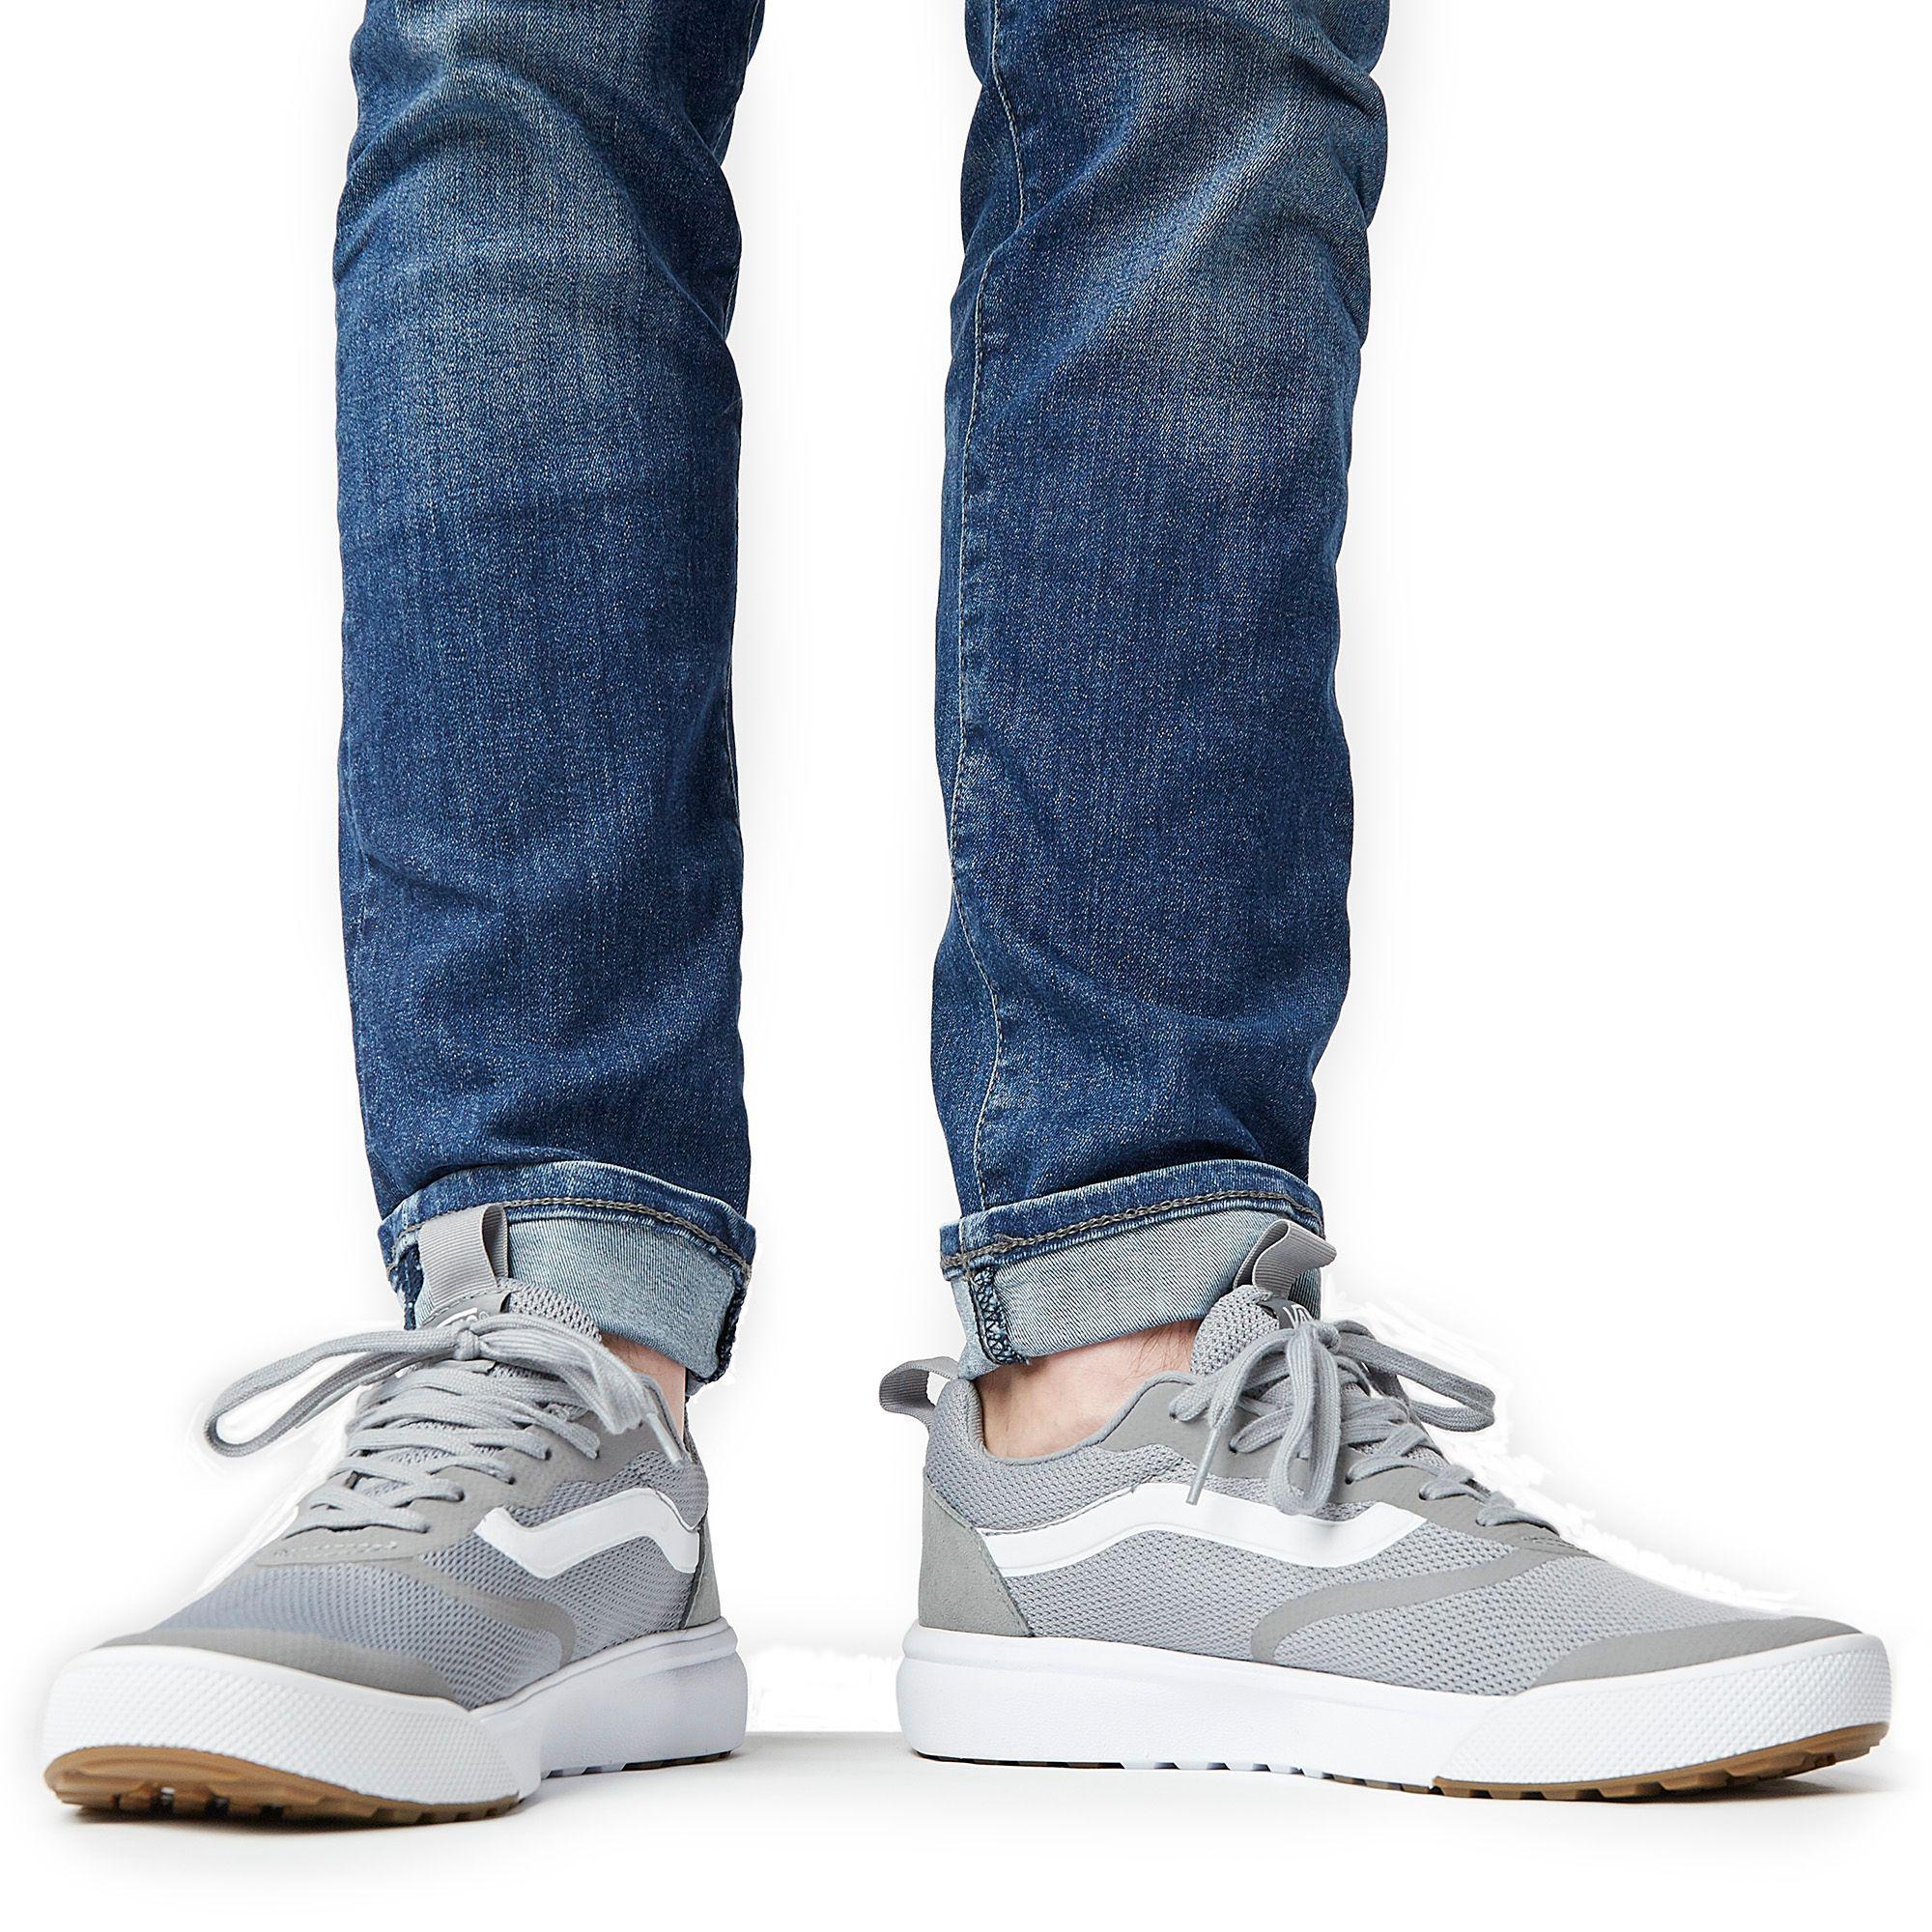 2c8c2097a14327 Lyst - Vans Ultrarange Rapidweld Shoes in Gray for Men